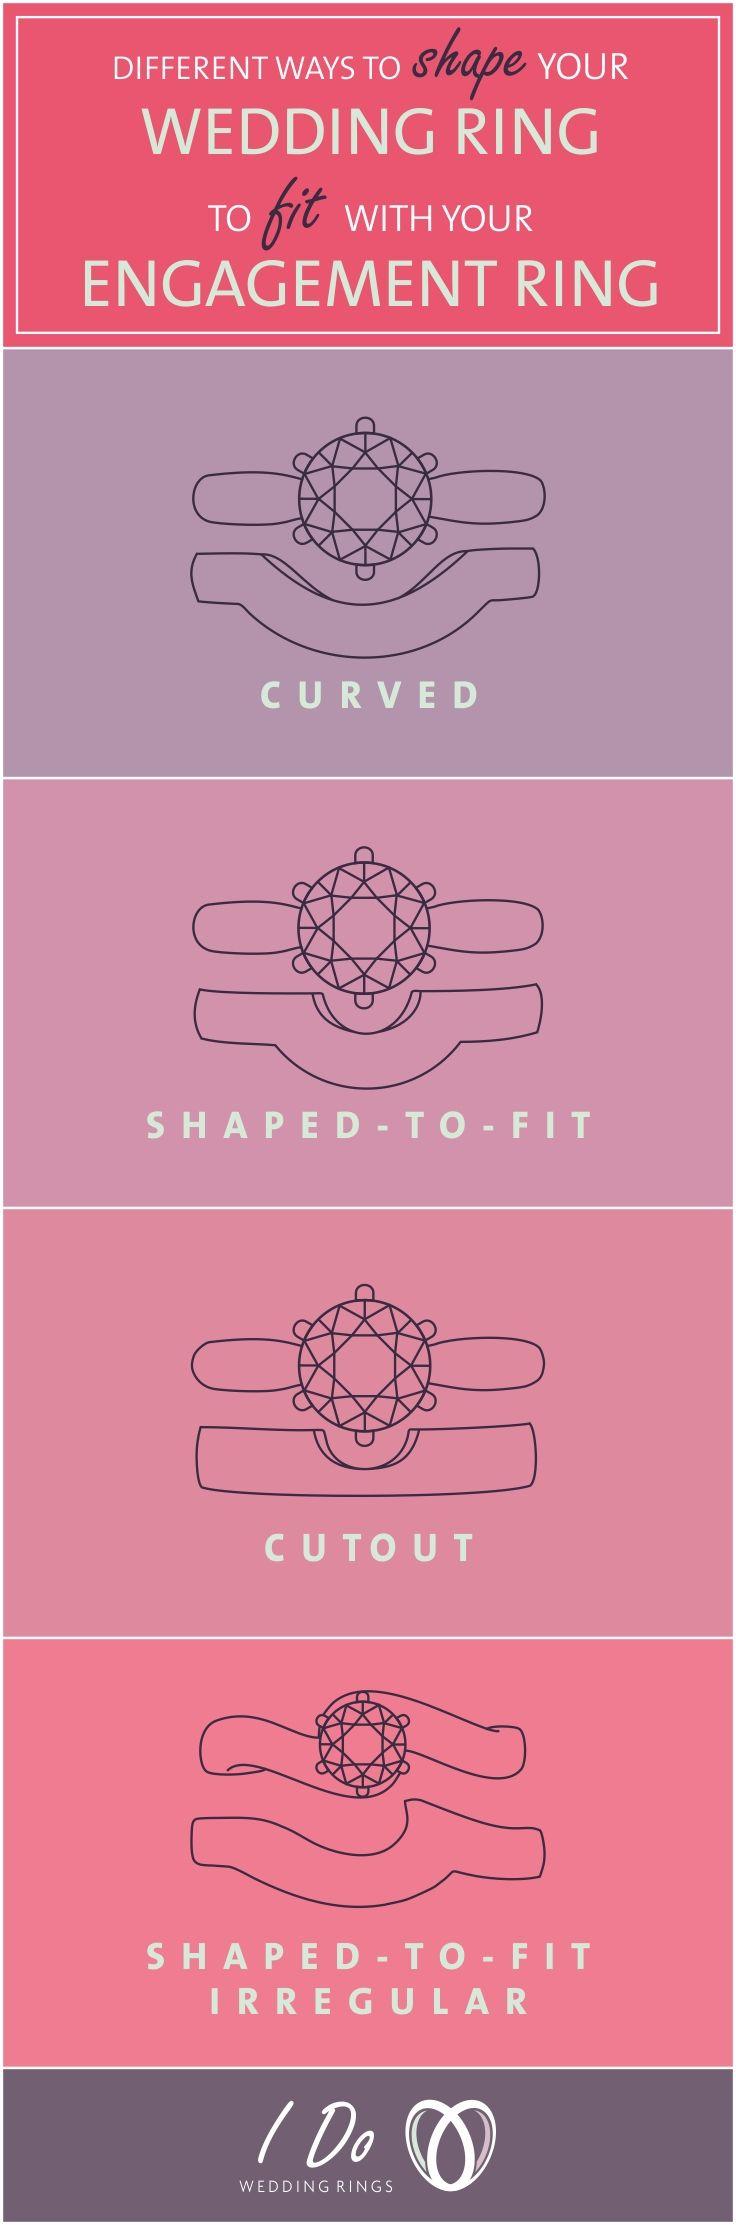 29 best Custom Wedding Ring Ideas images on Pinterest | Wedding ...